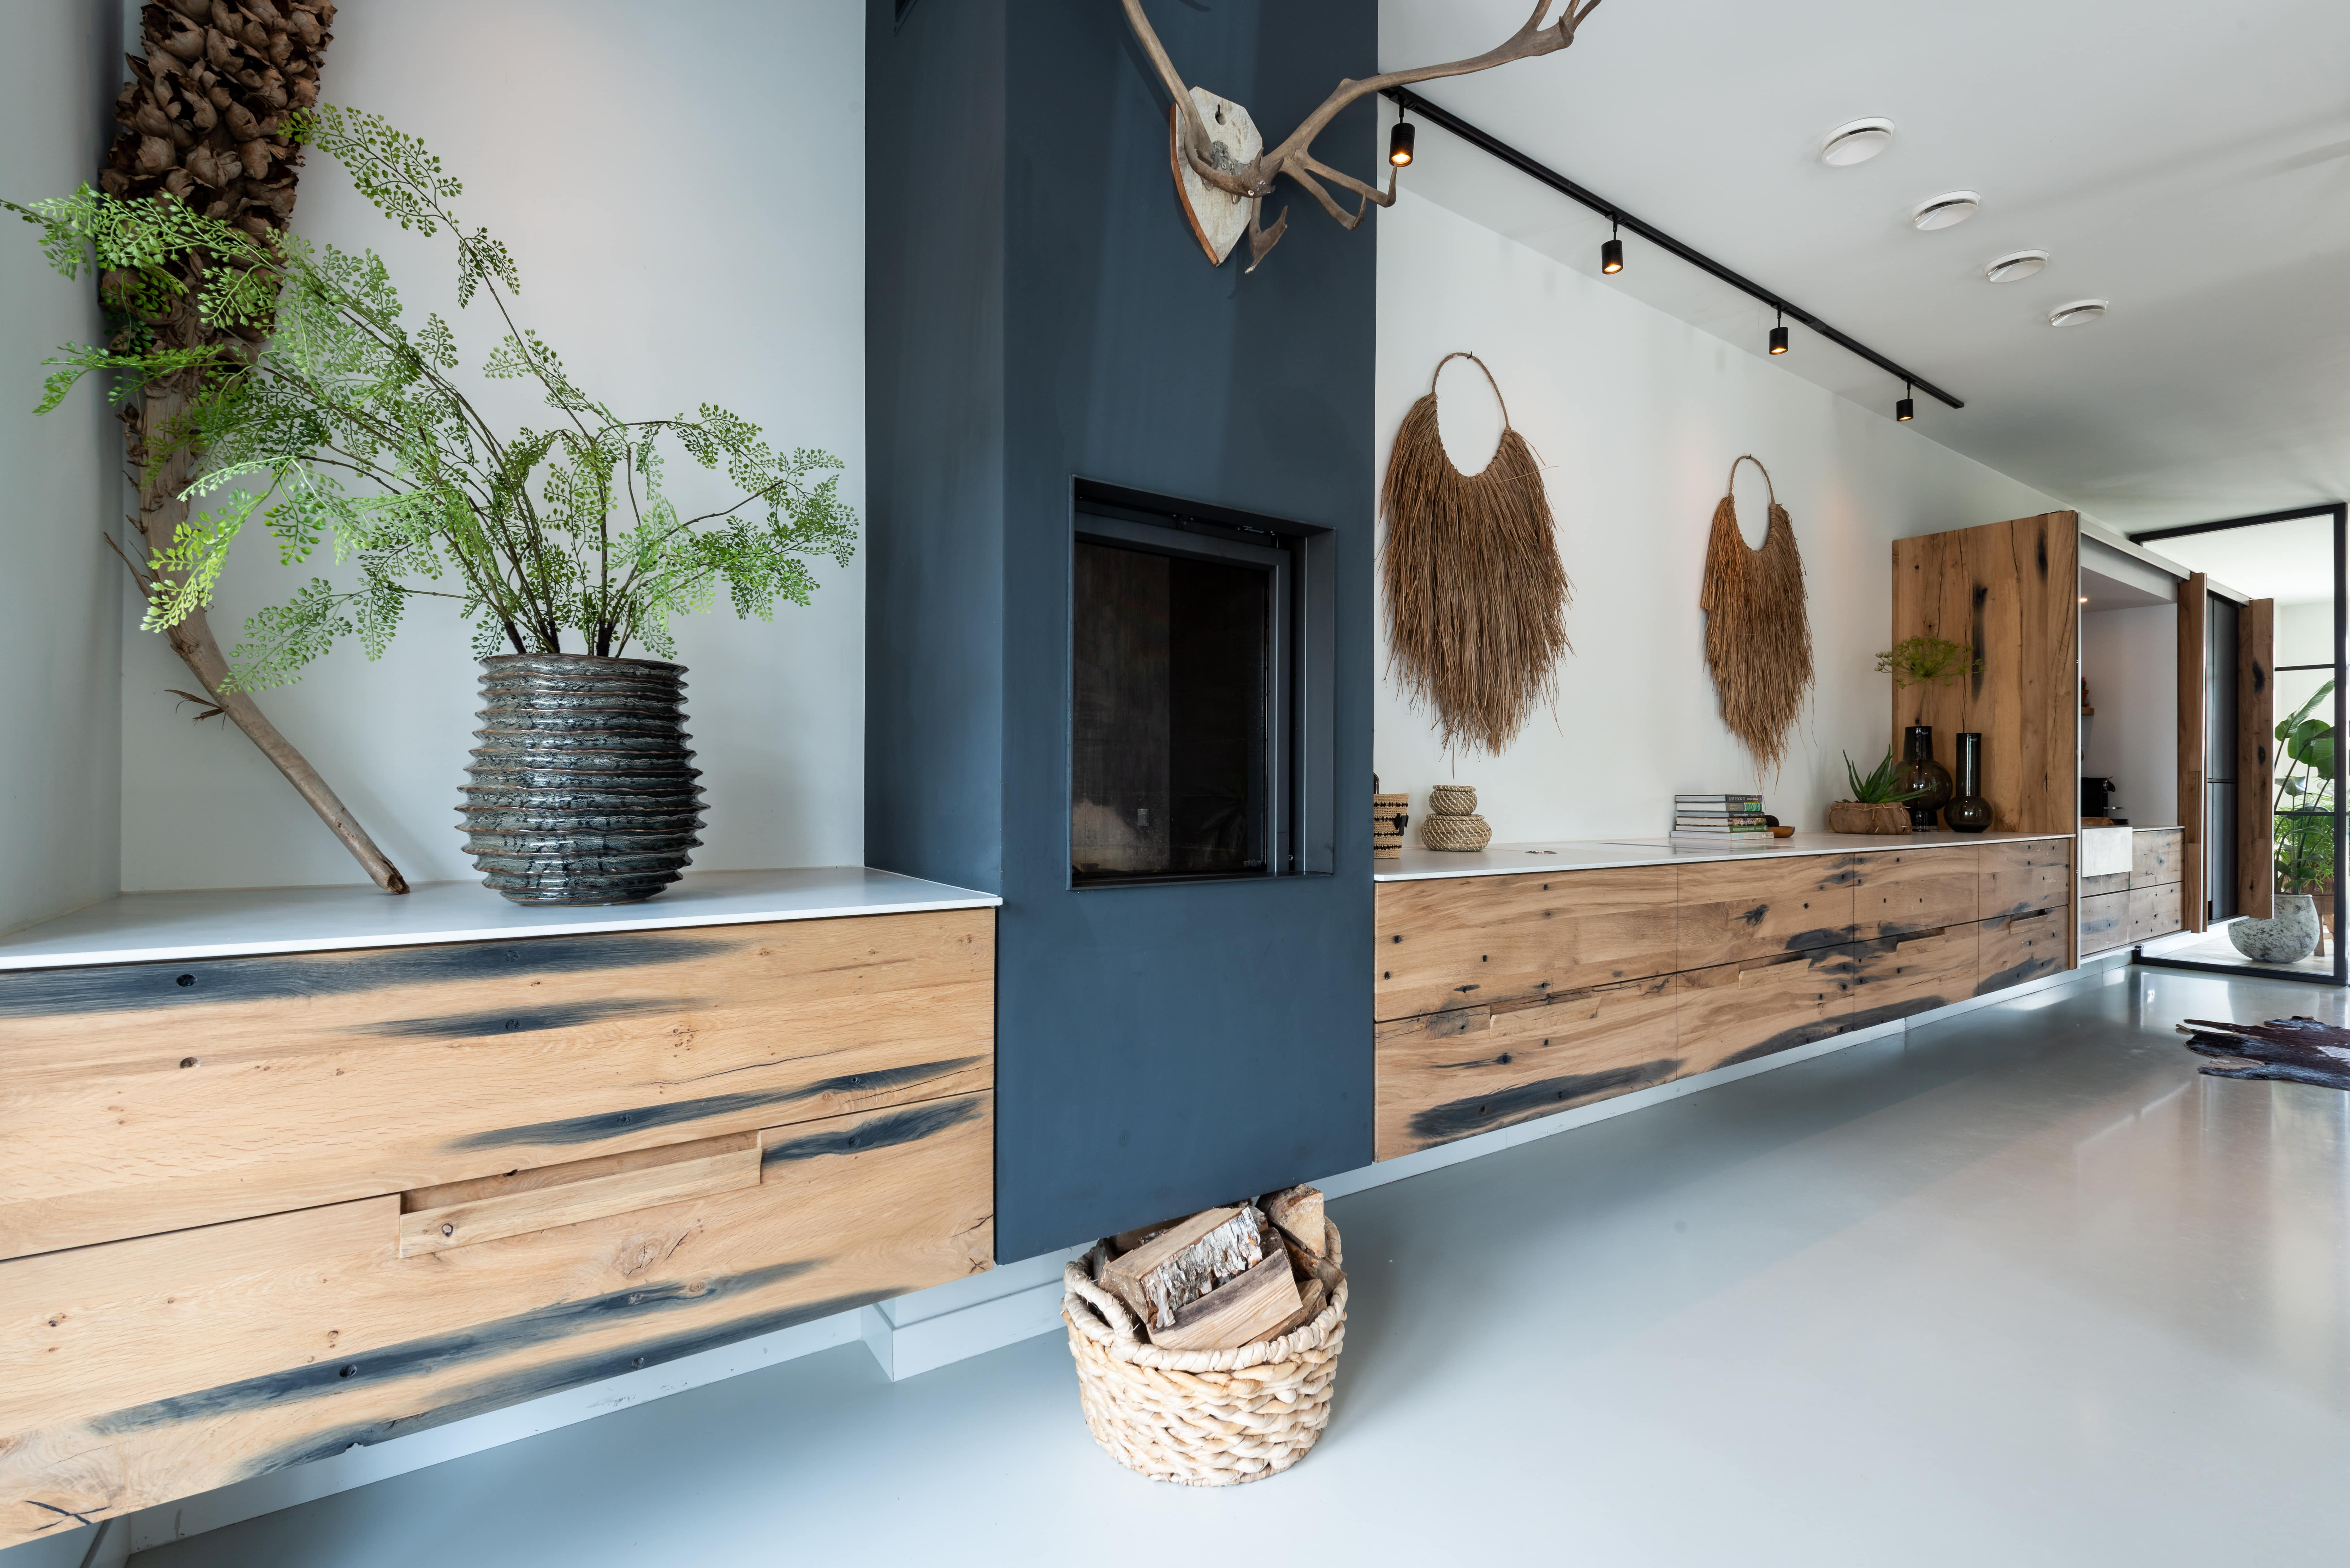 Sfeervol wandmeubel & duurzame keuken ineen